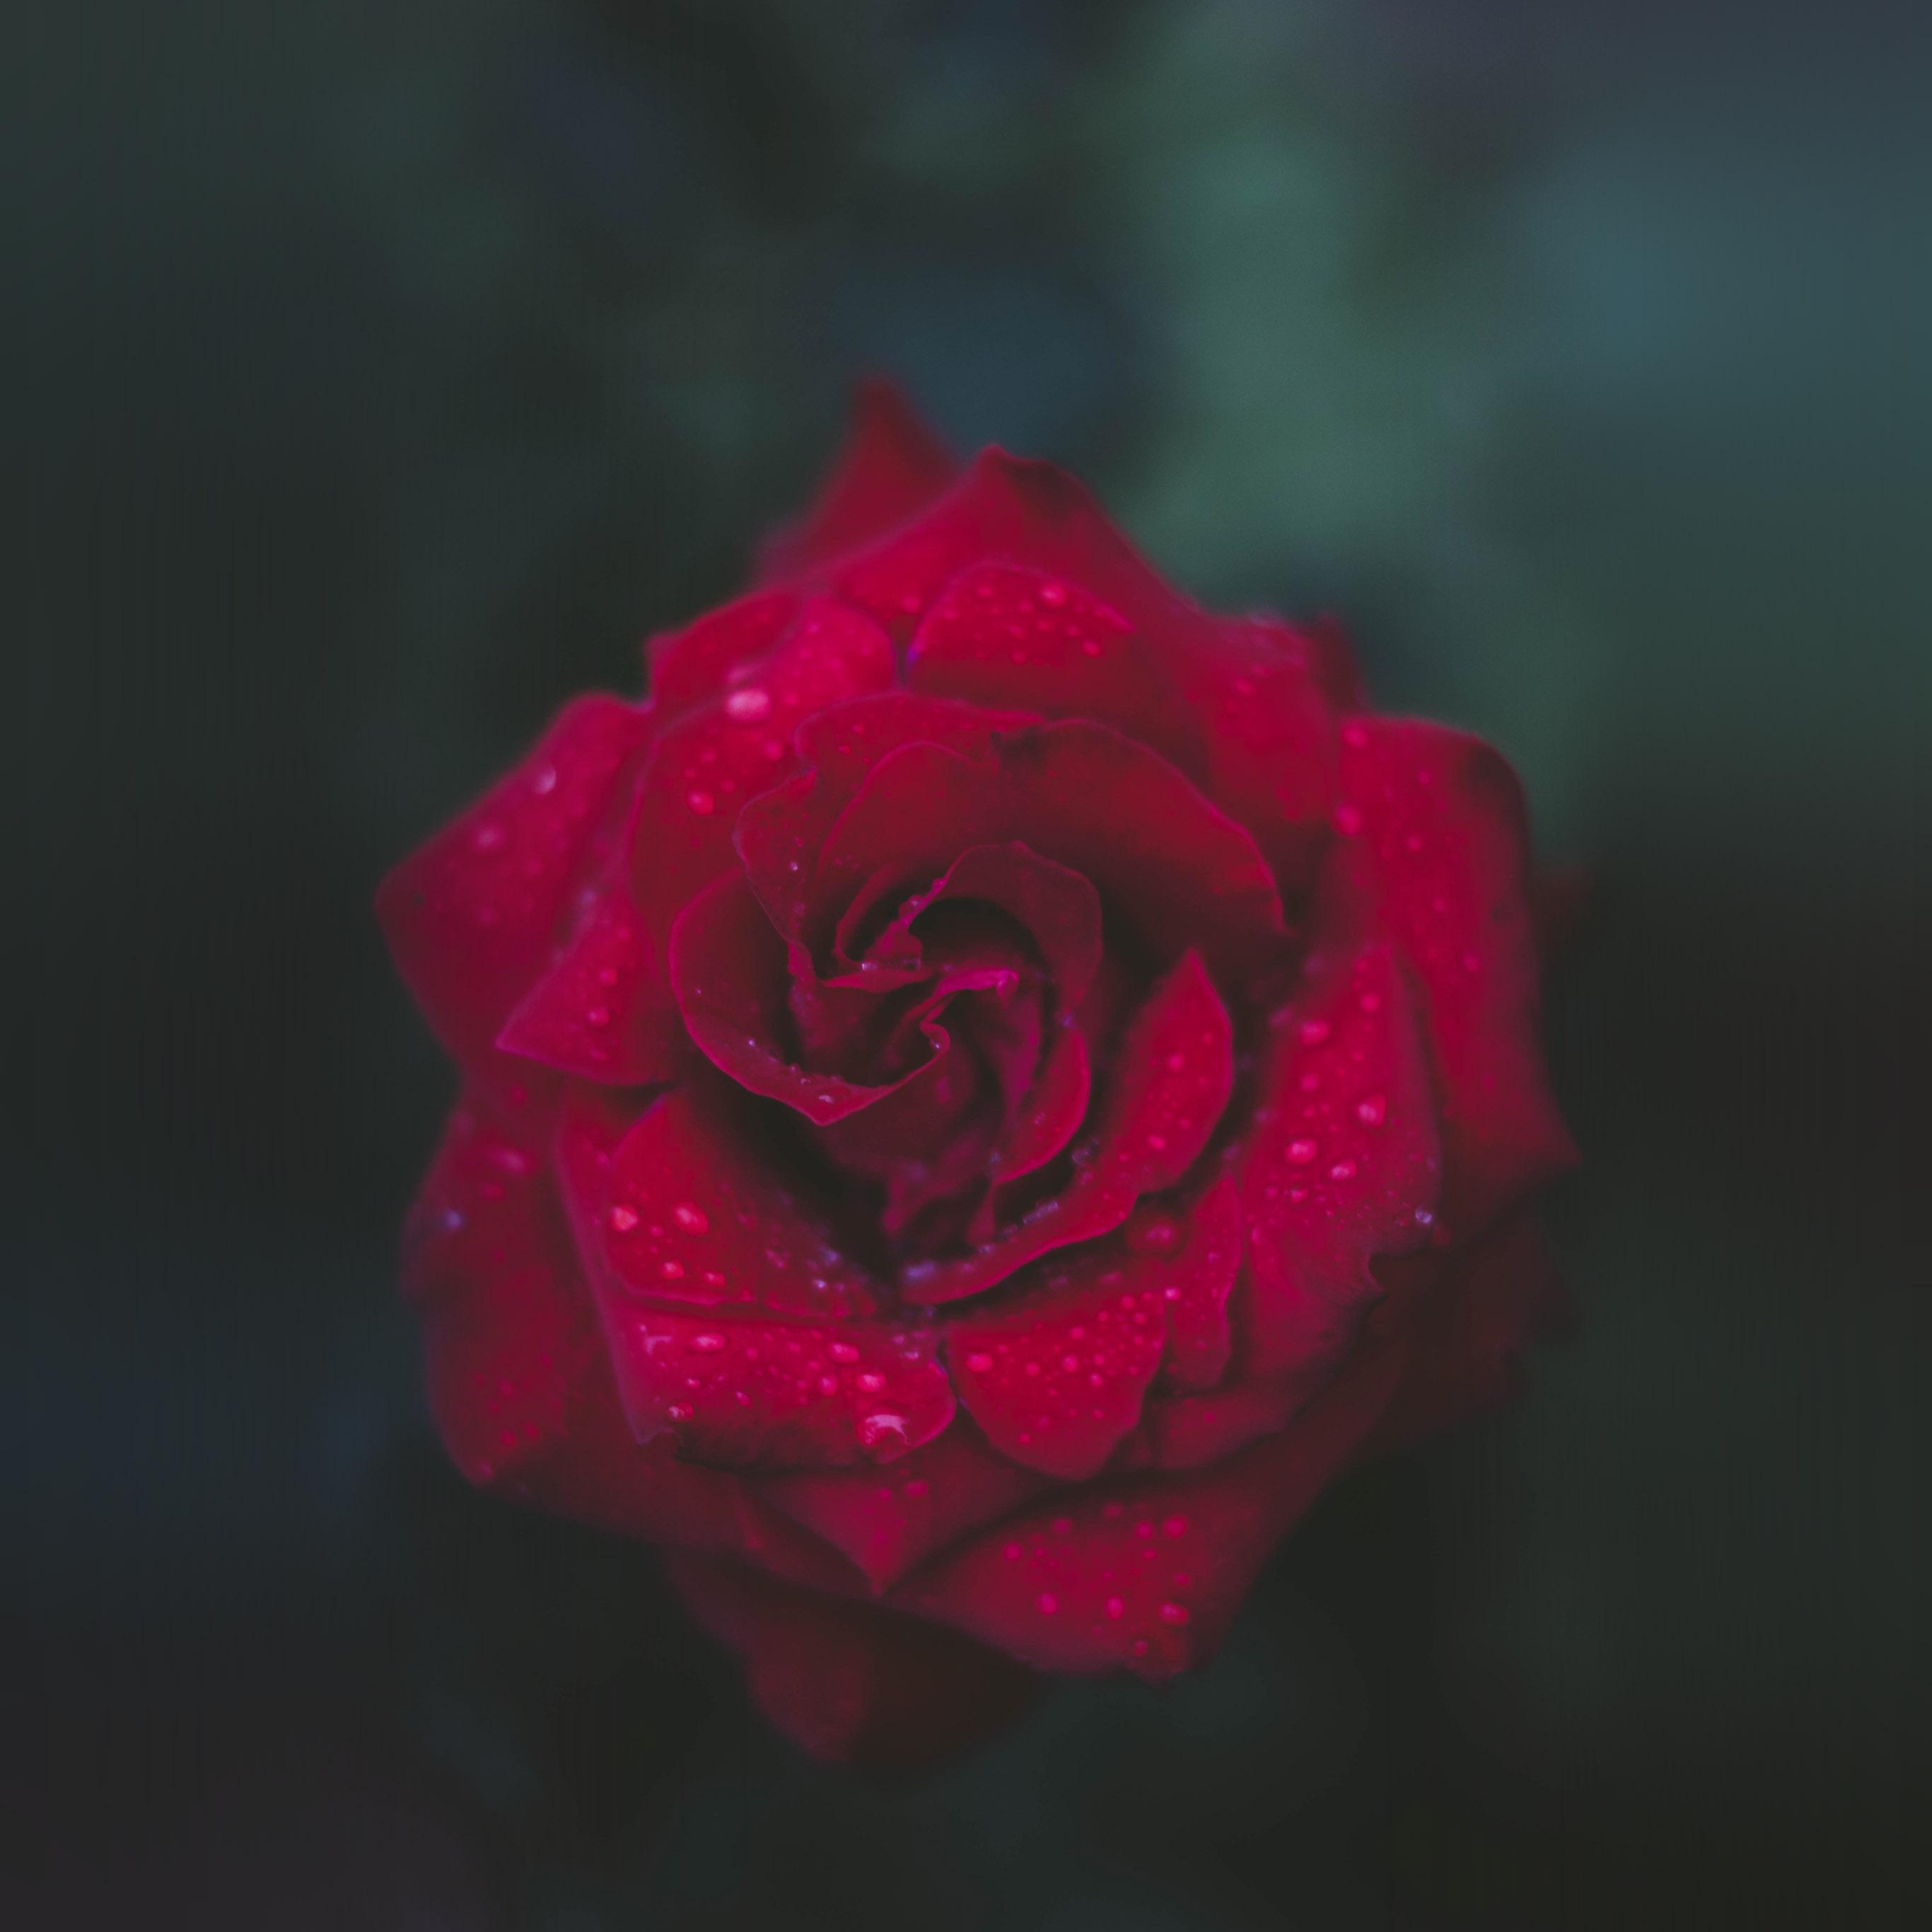 Nv54 Rose Red Flower Nature Wallpaper